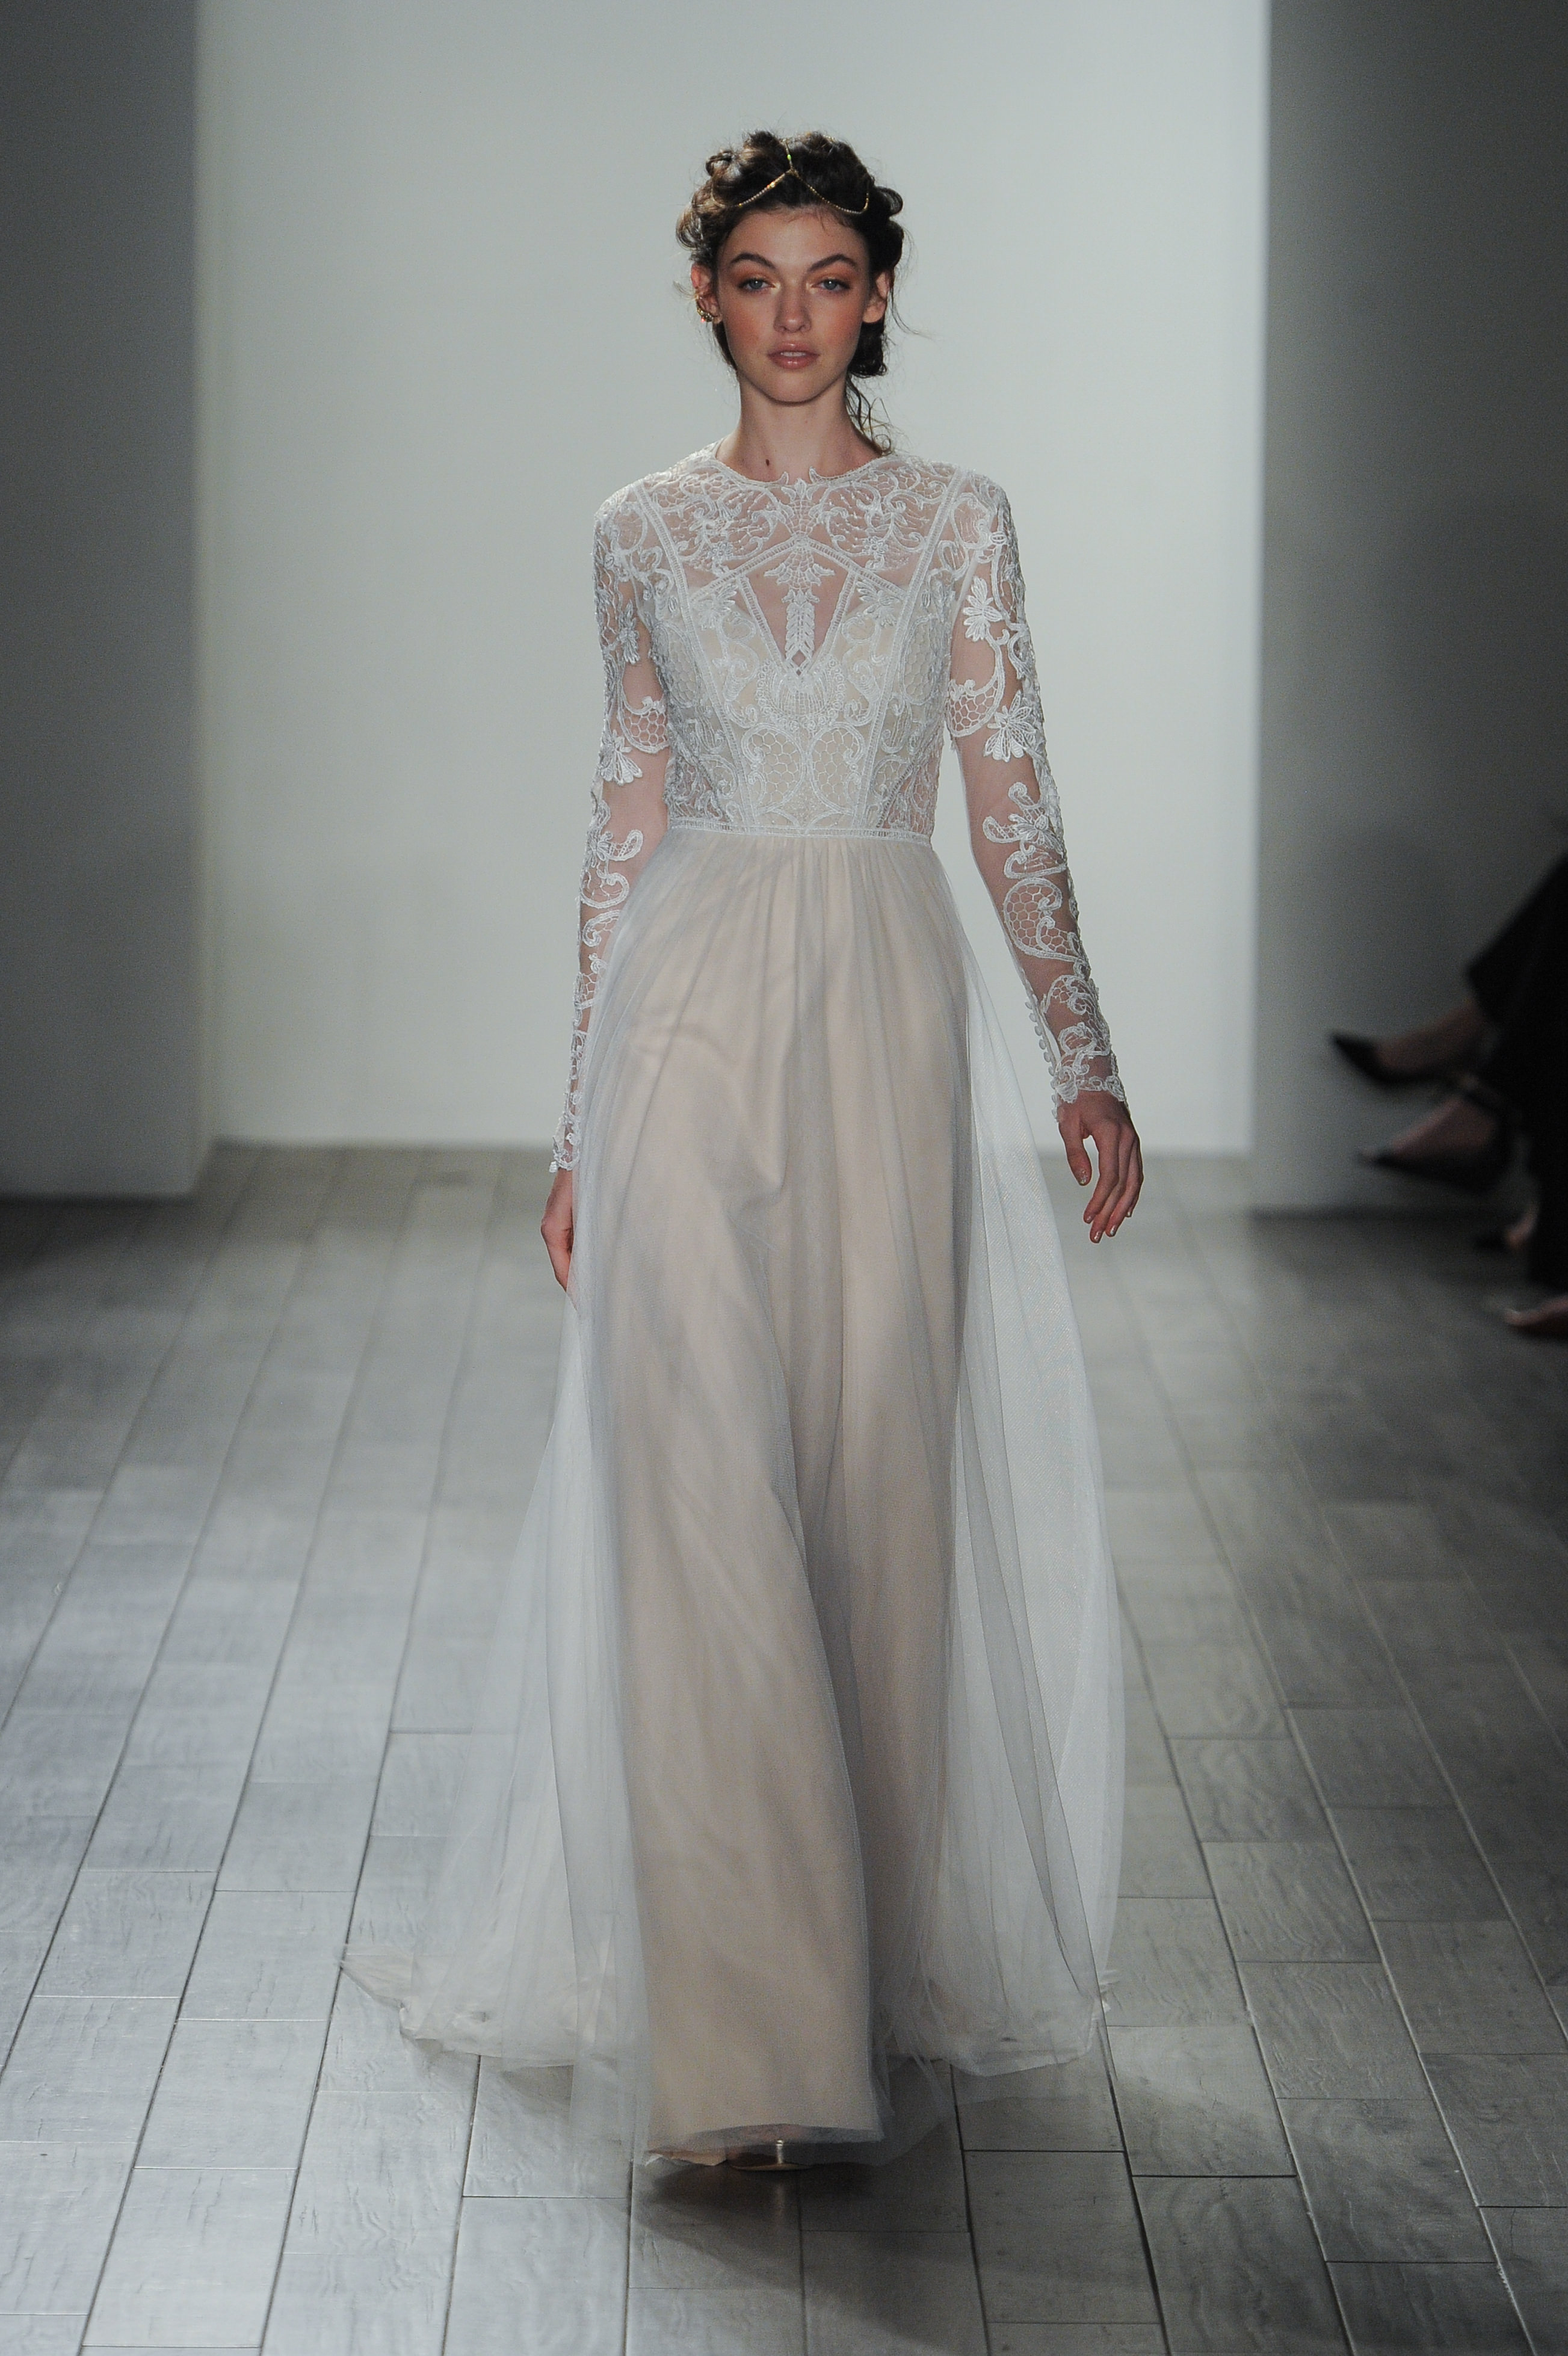 ti adora bridal ava wedding dresses Wedding Dress wedding dresses bridal shop store gowns christchurch wellington